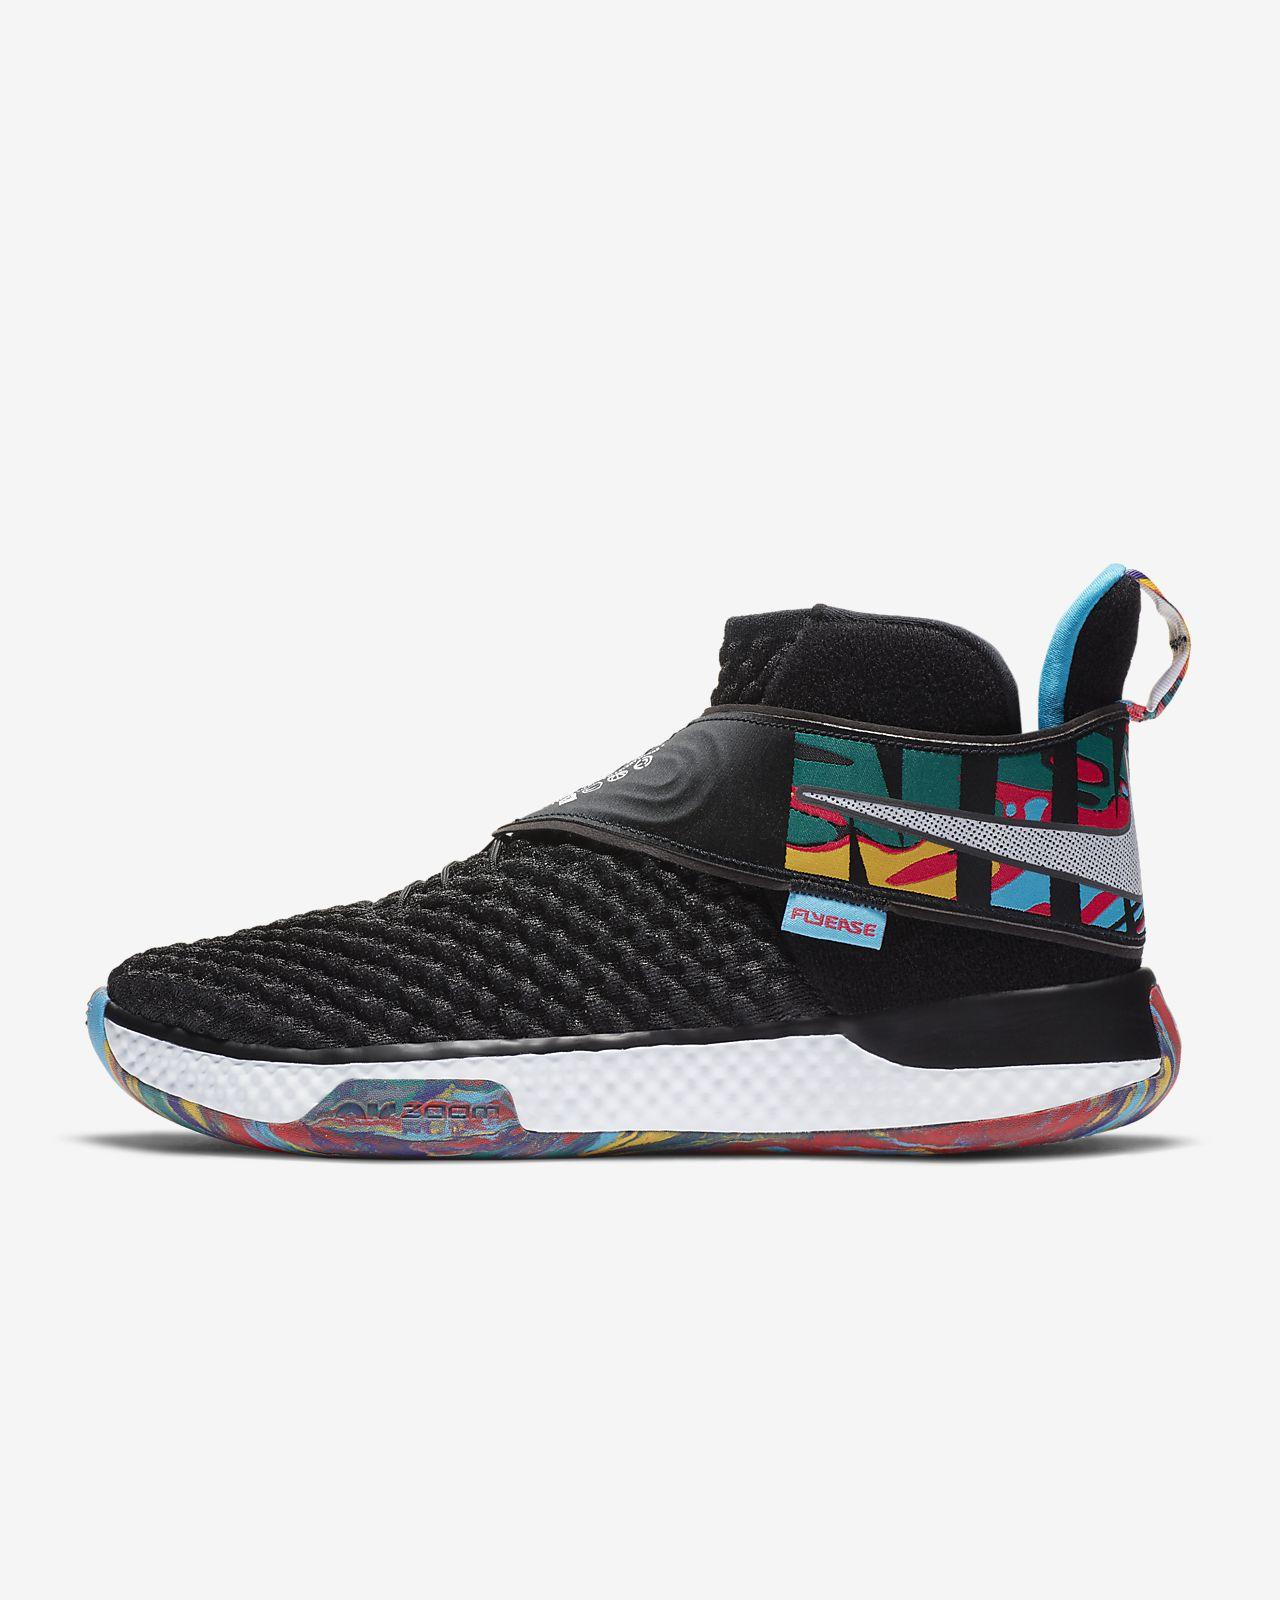 Nike Air Zoom UNVRS FlyEase Basketballschuh